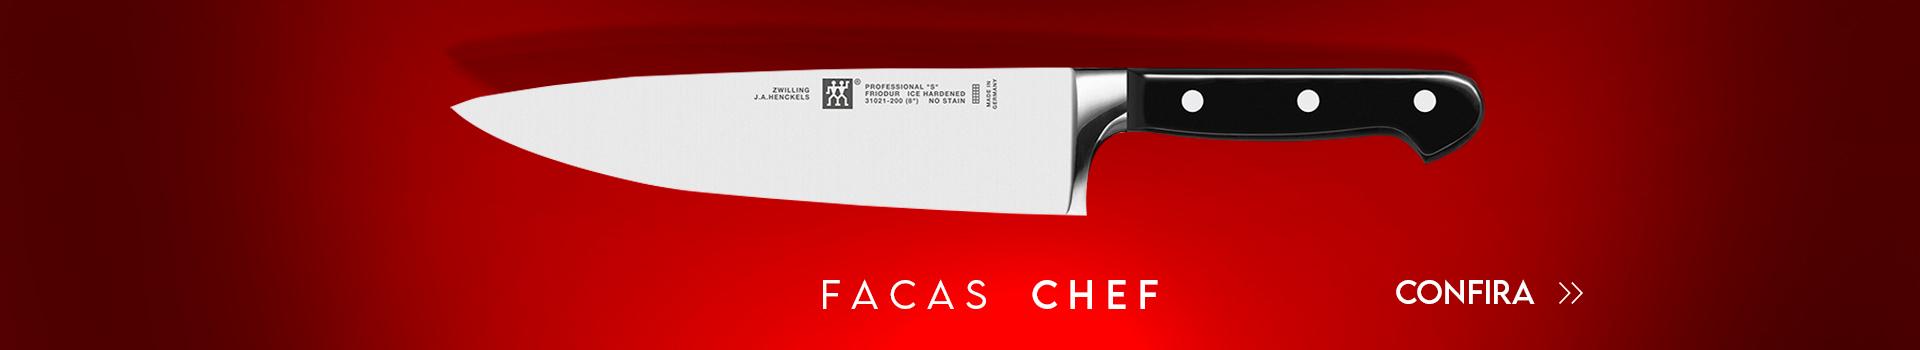 BANNER HEAD HOME - FACAS CHEF